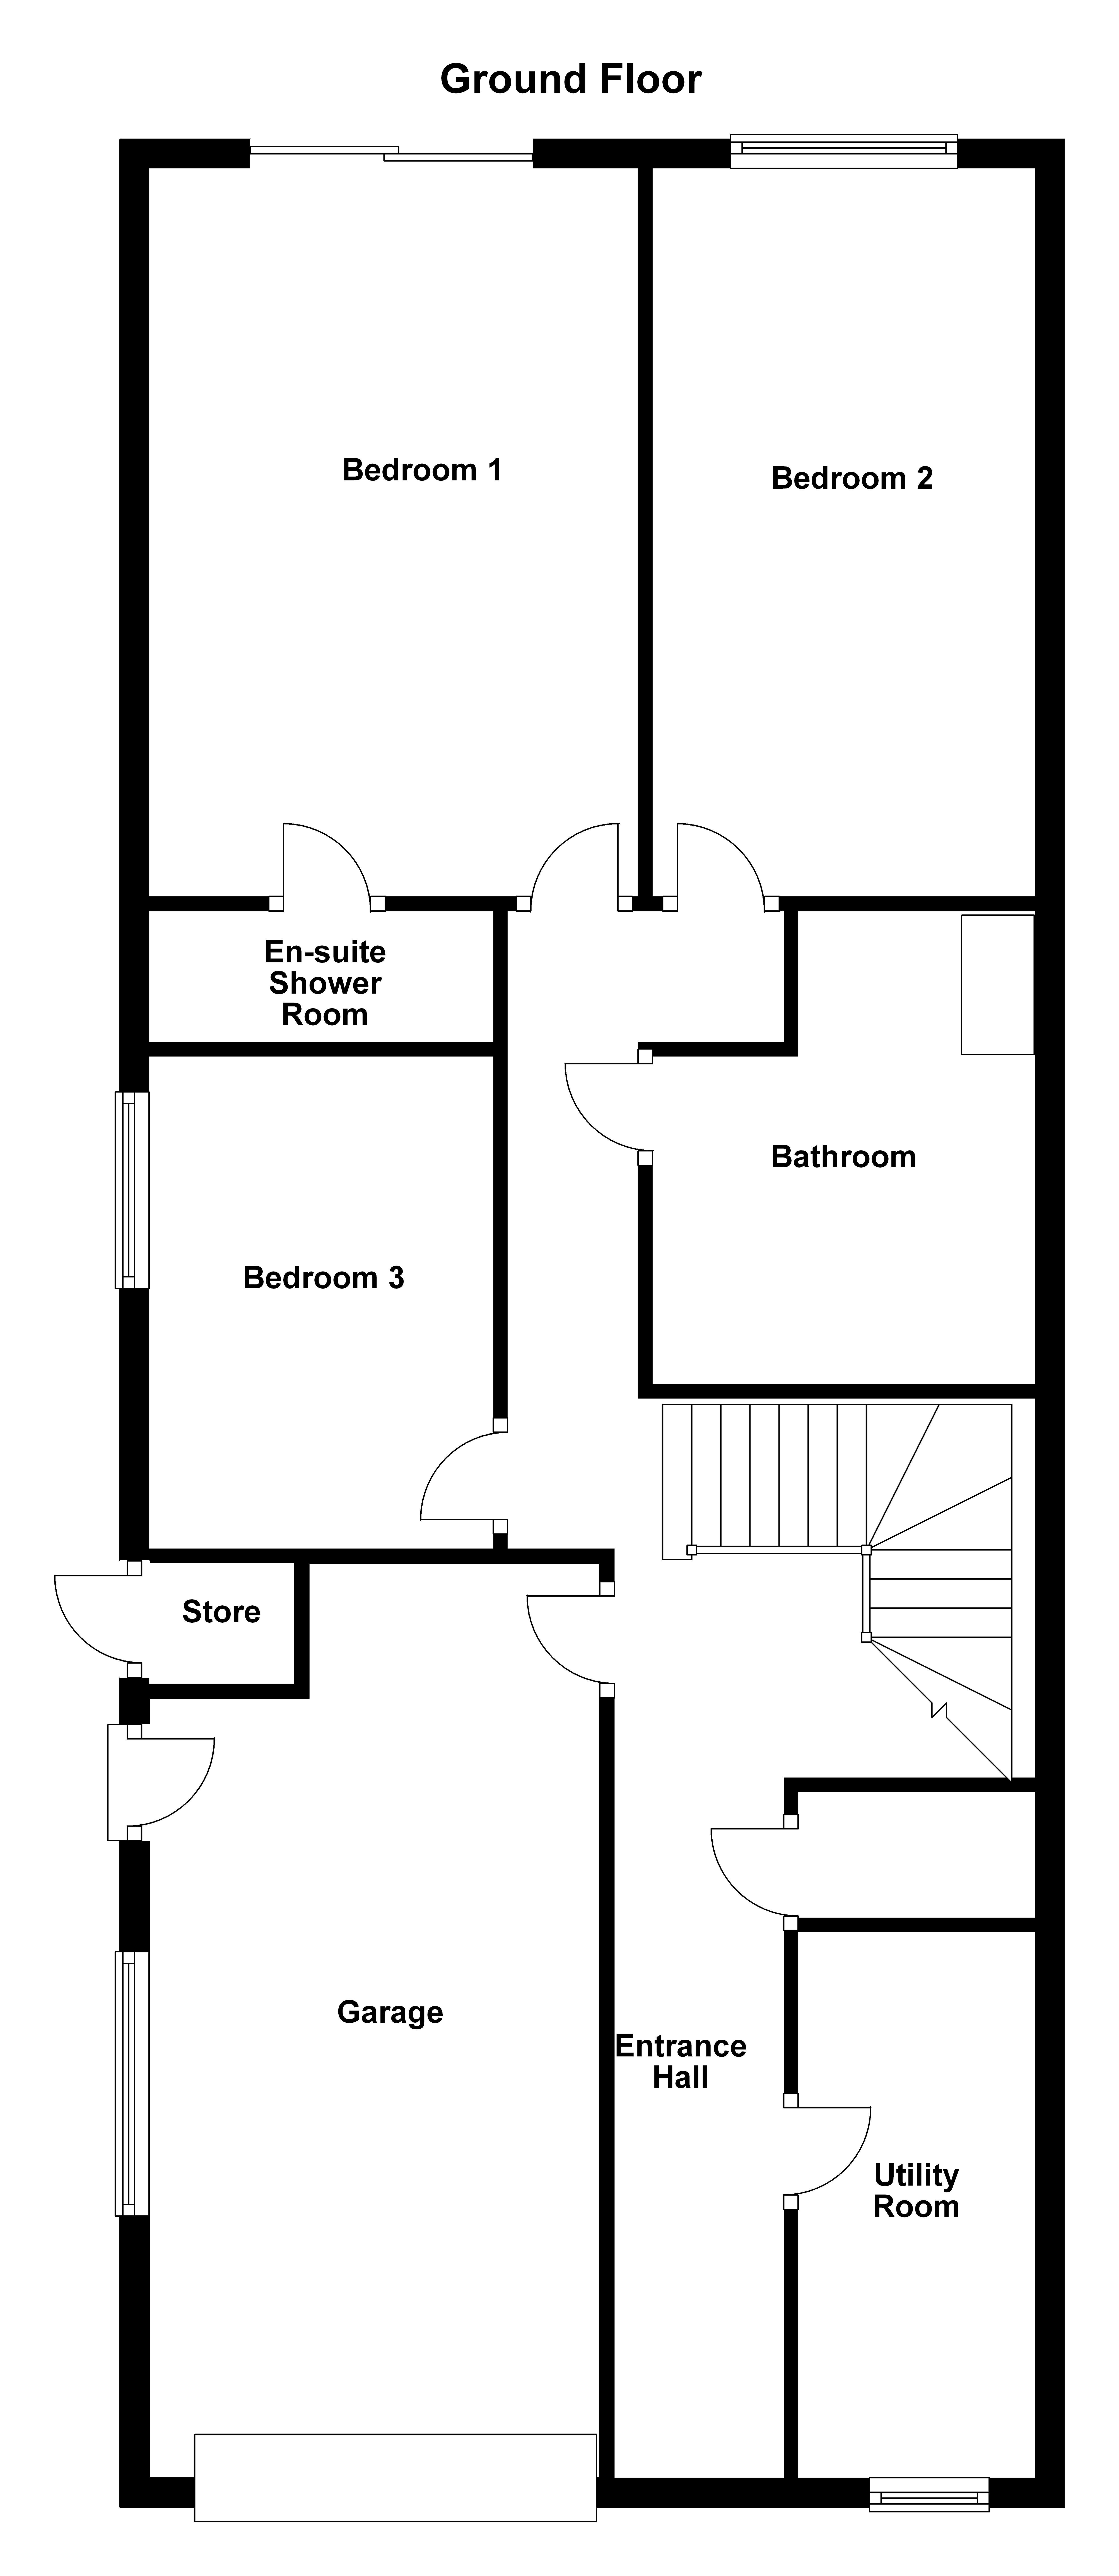 Ground Floor (plot 6)